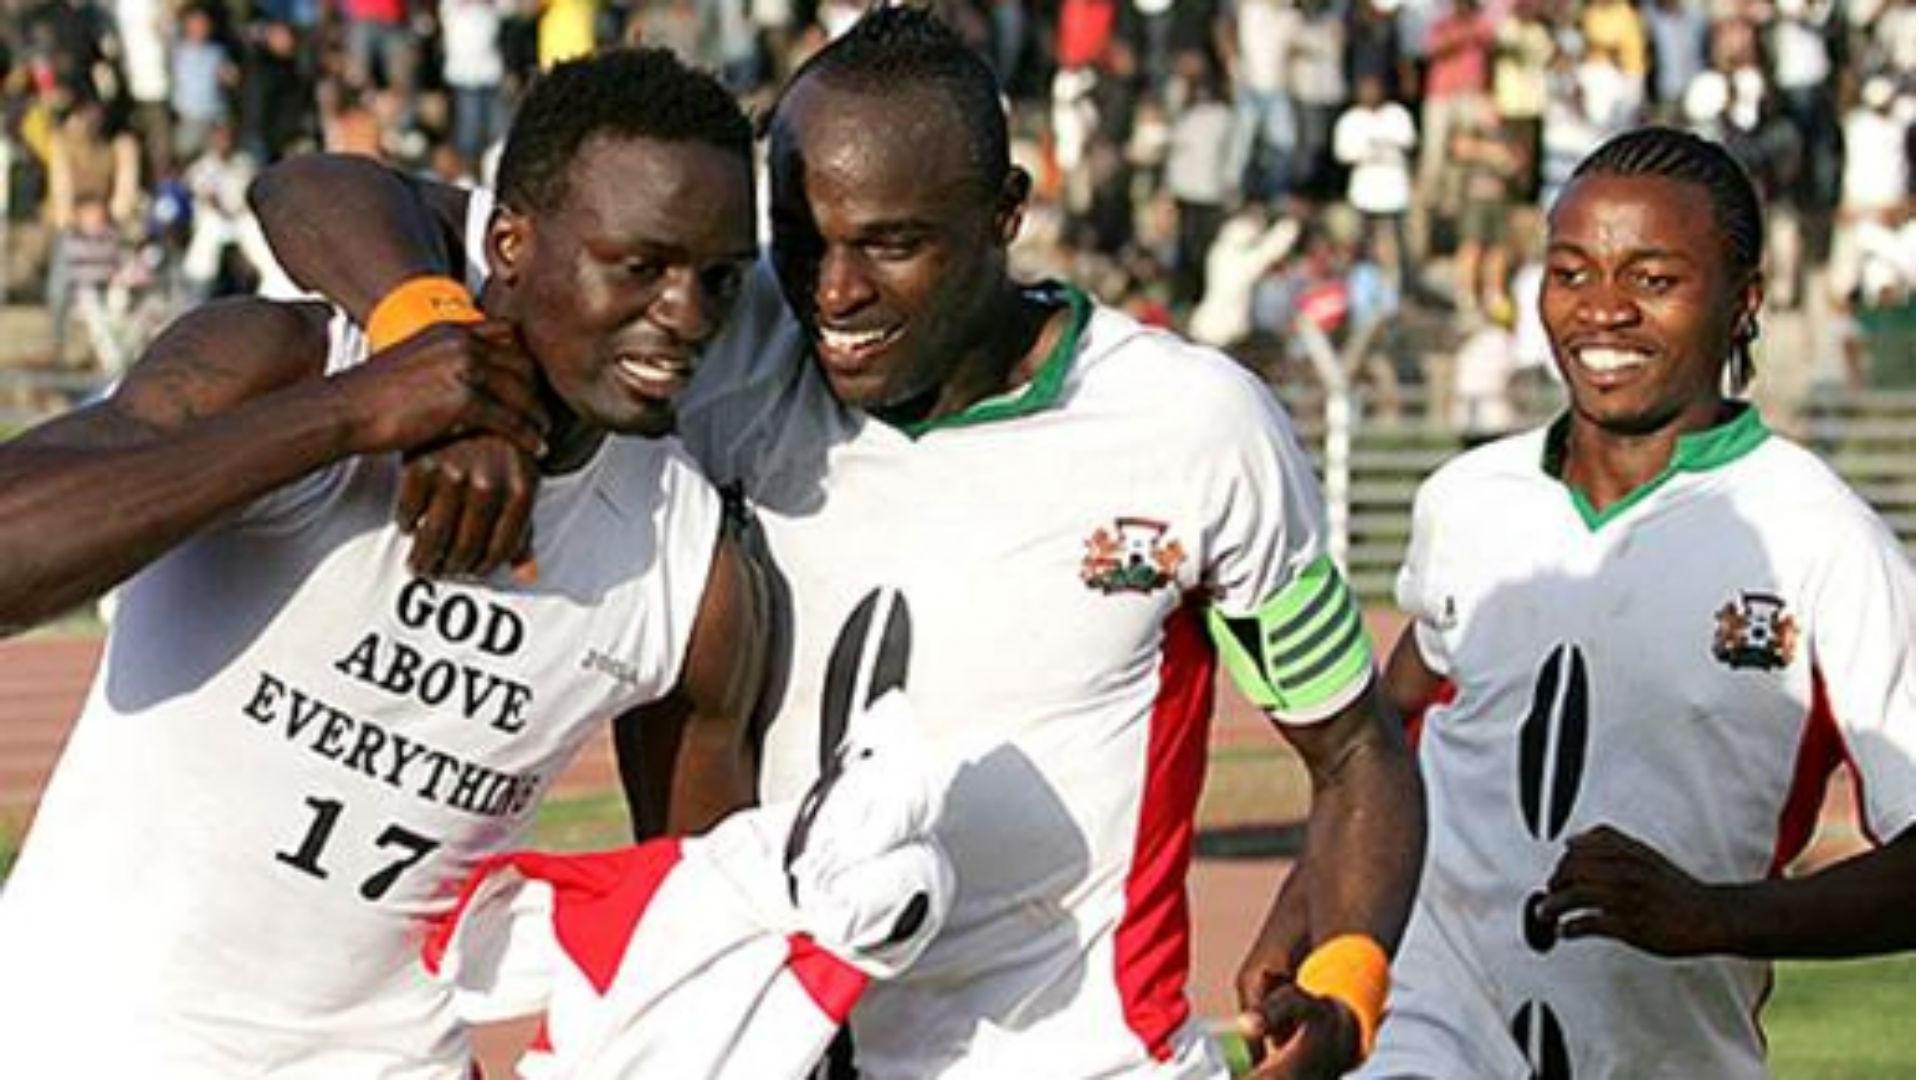 FKF's Mwendwa should resign for taking Kenyan football backwards – Mariga